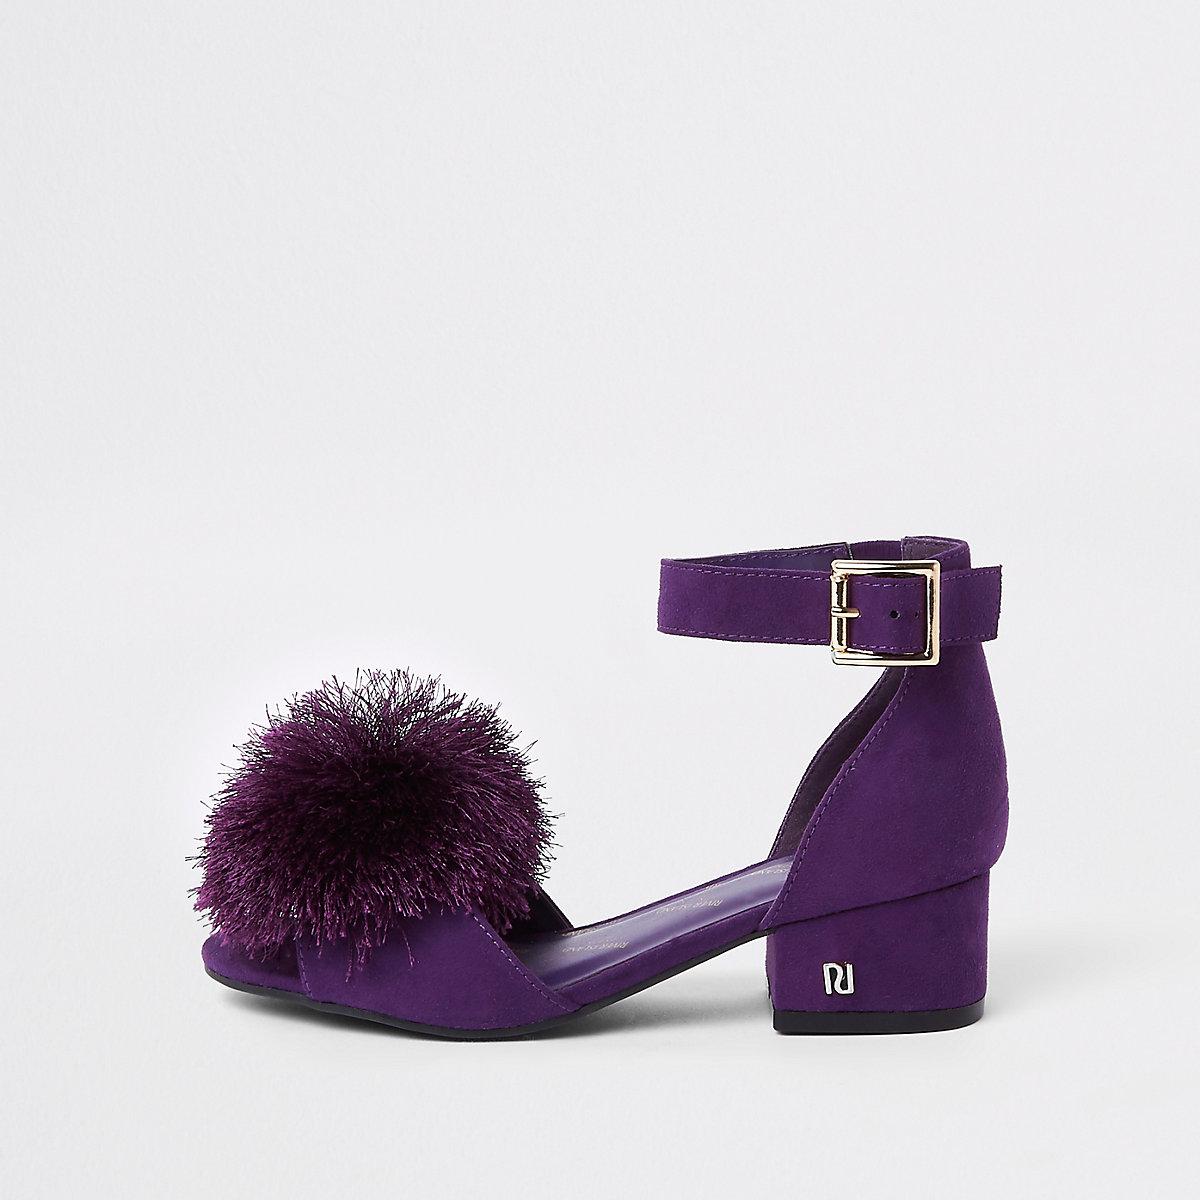 Girls purple pom pom block heel sandals